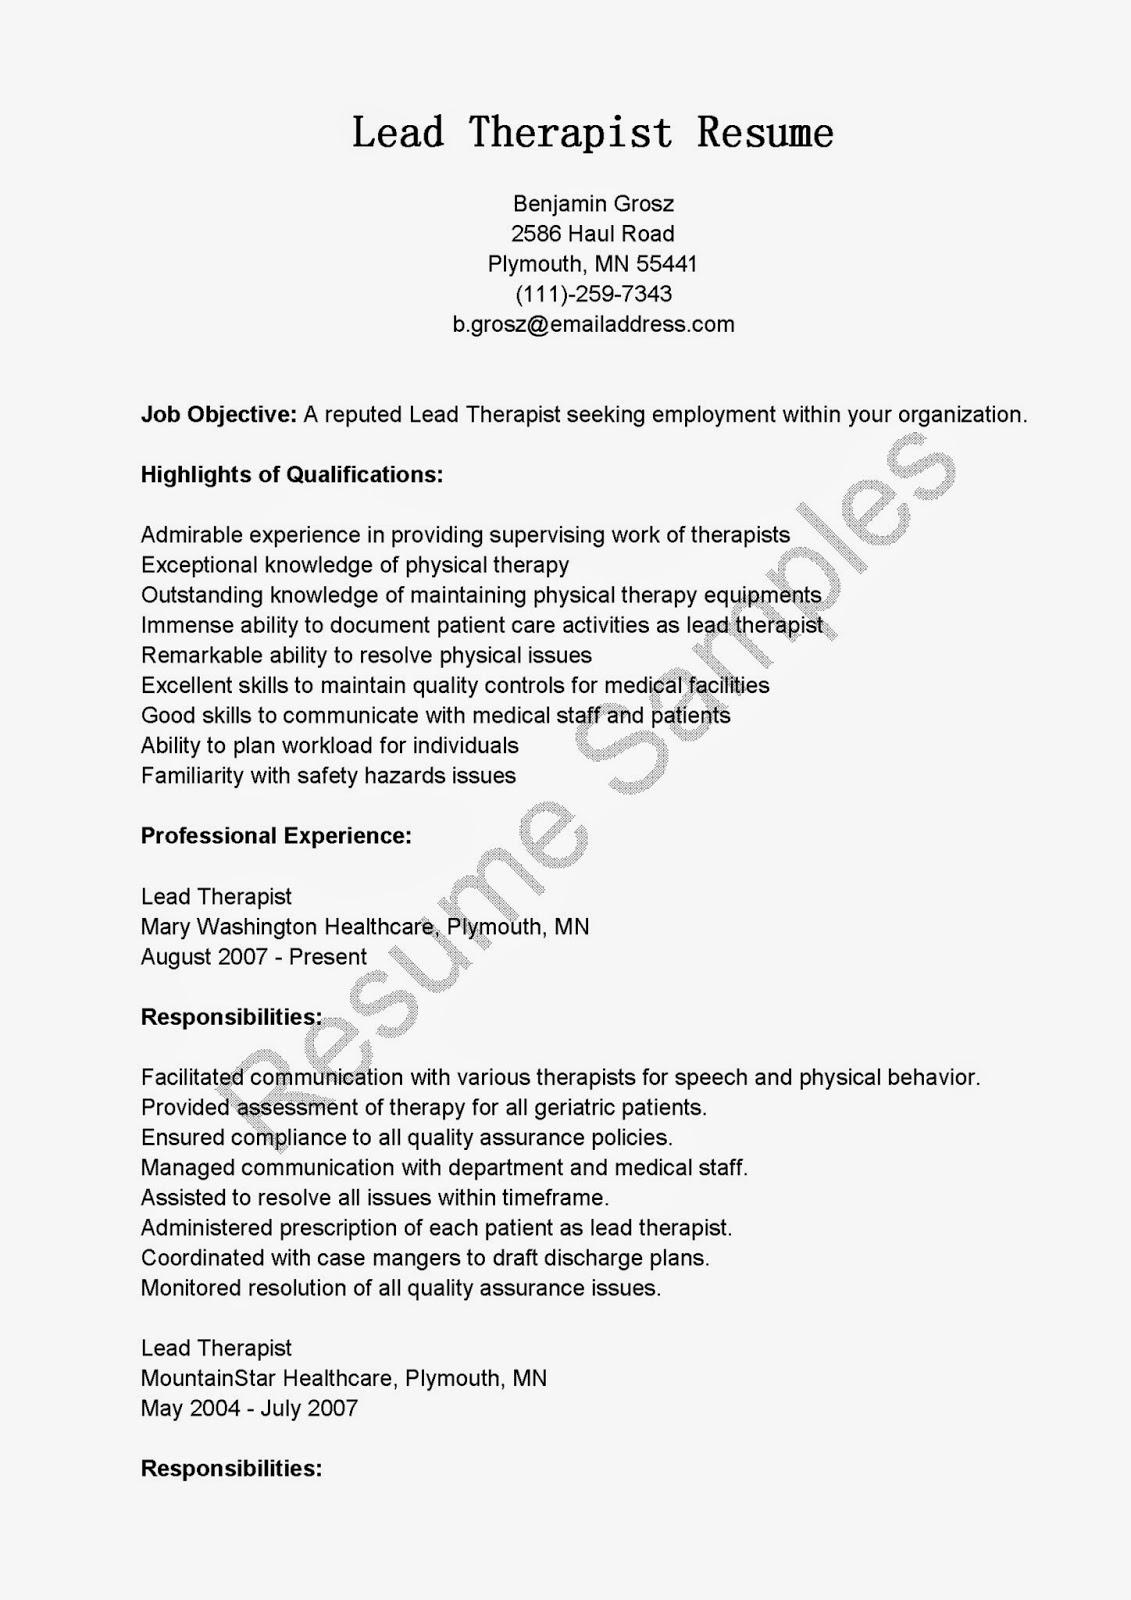 resume samples lead therapist resume sample